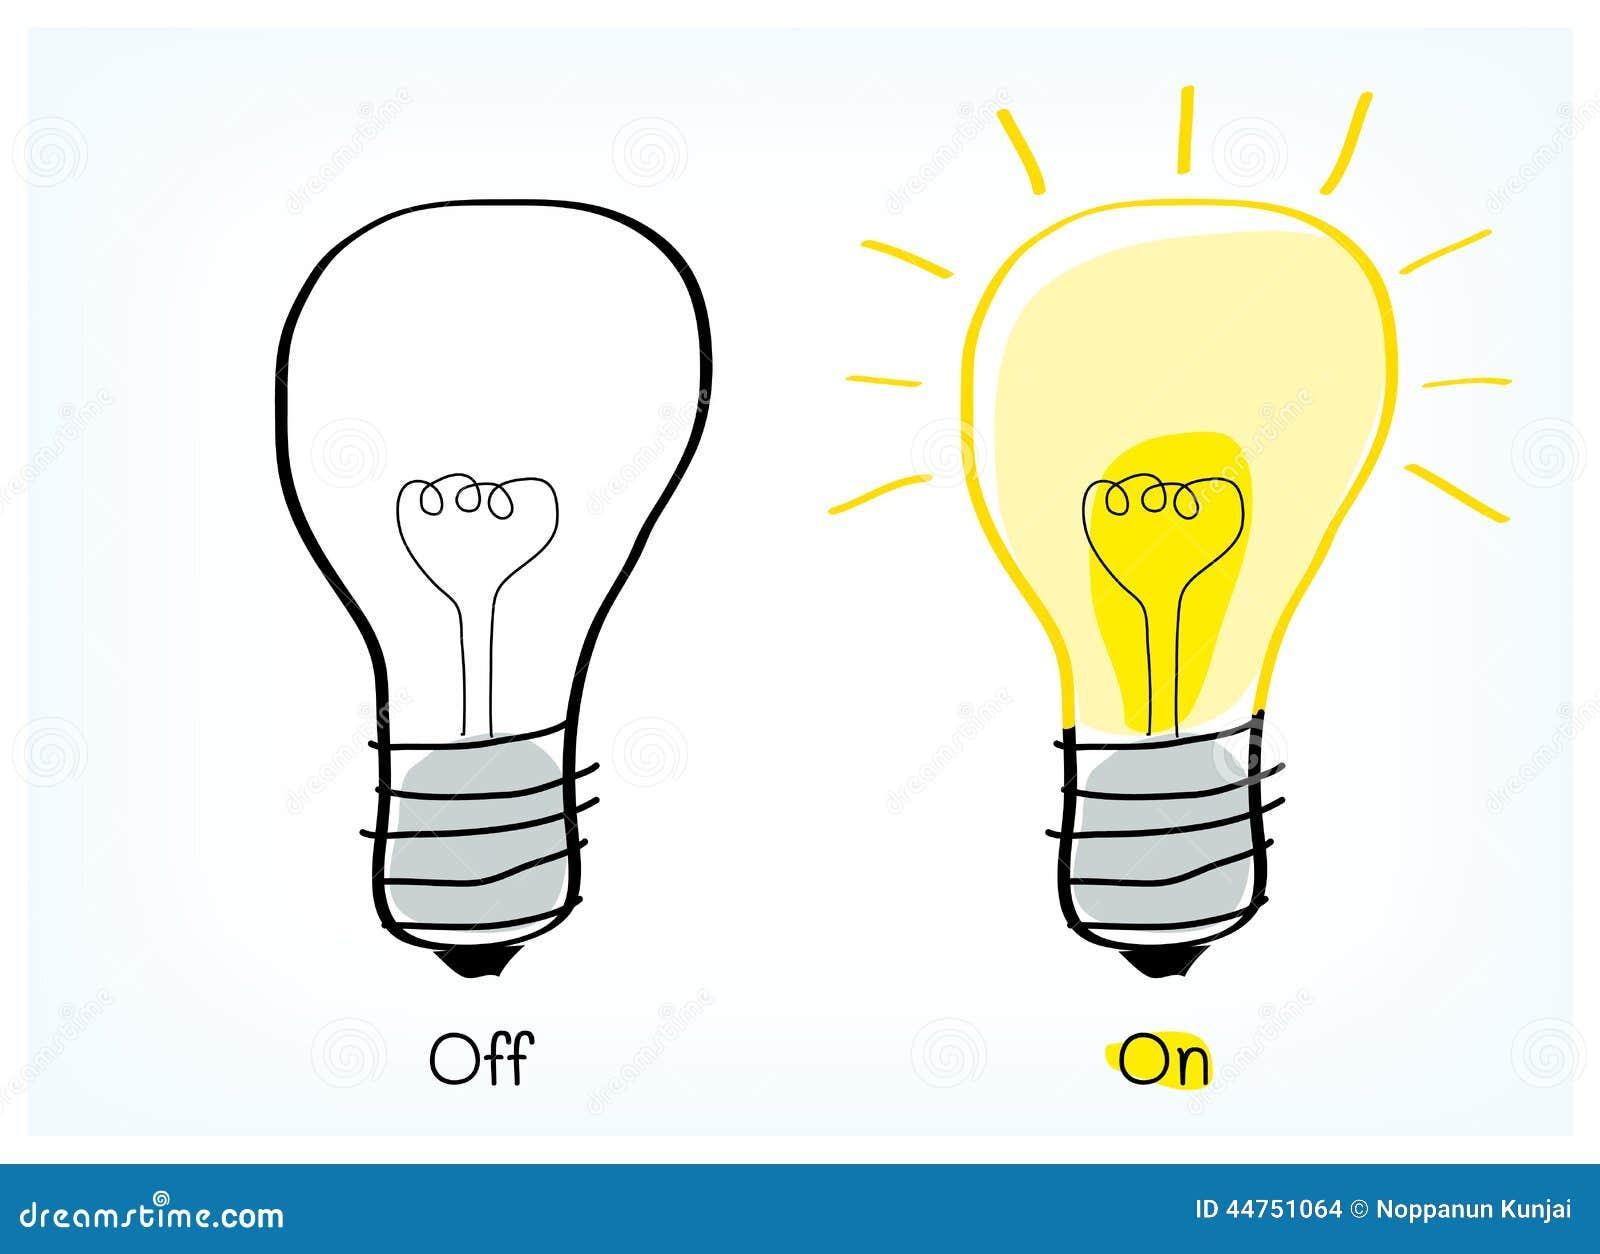 on and off light bulb idea stock vector illustration of light bulb vector art light bulb vector art free